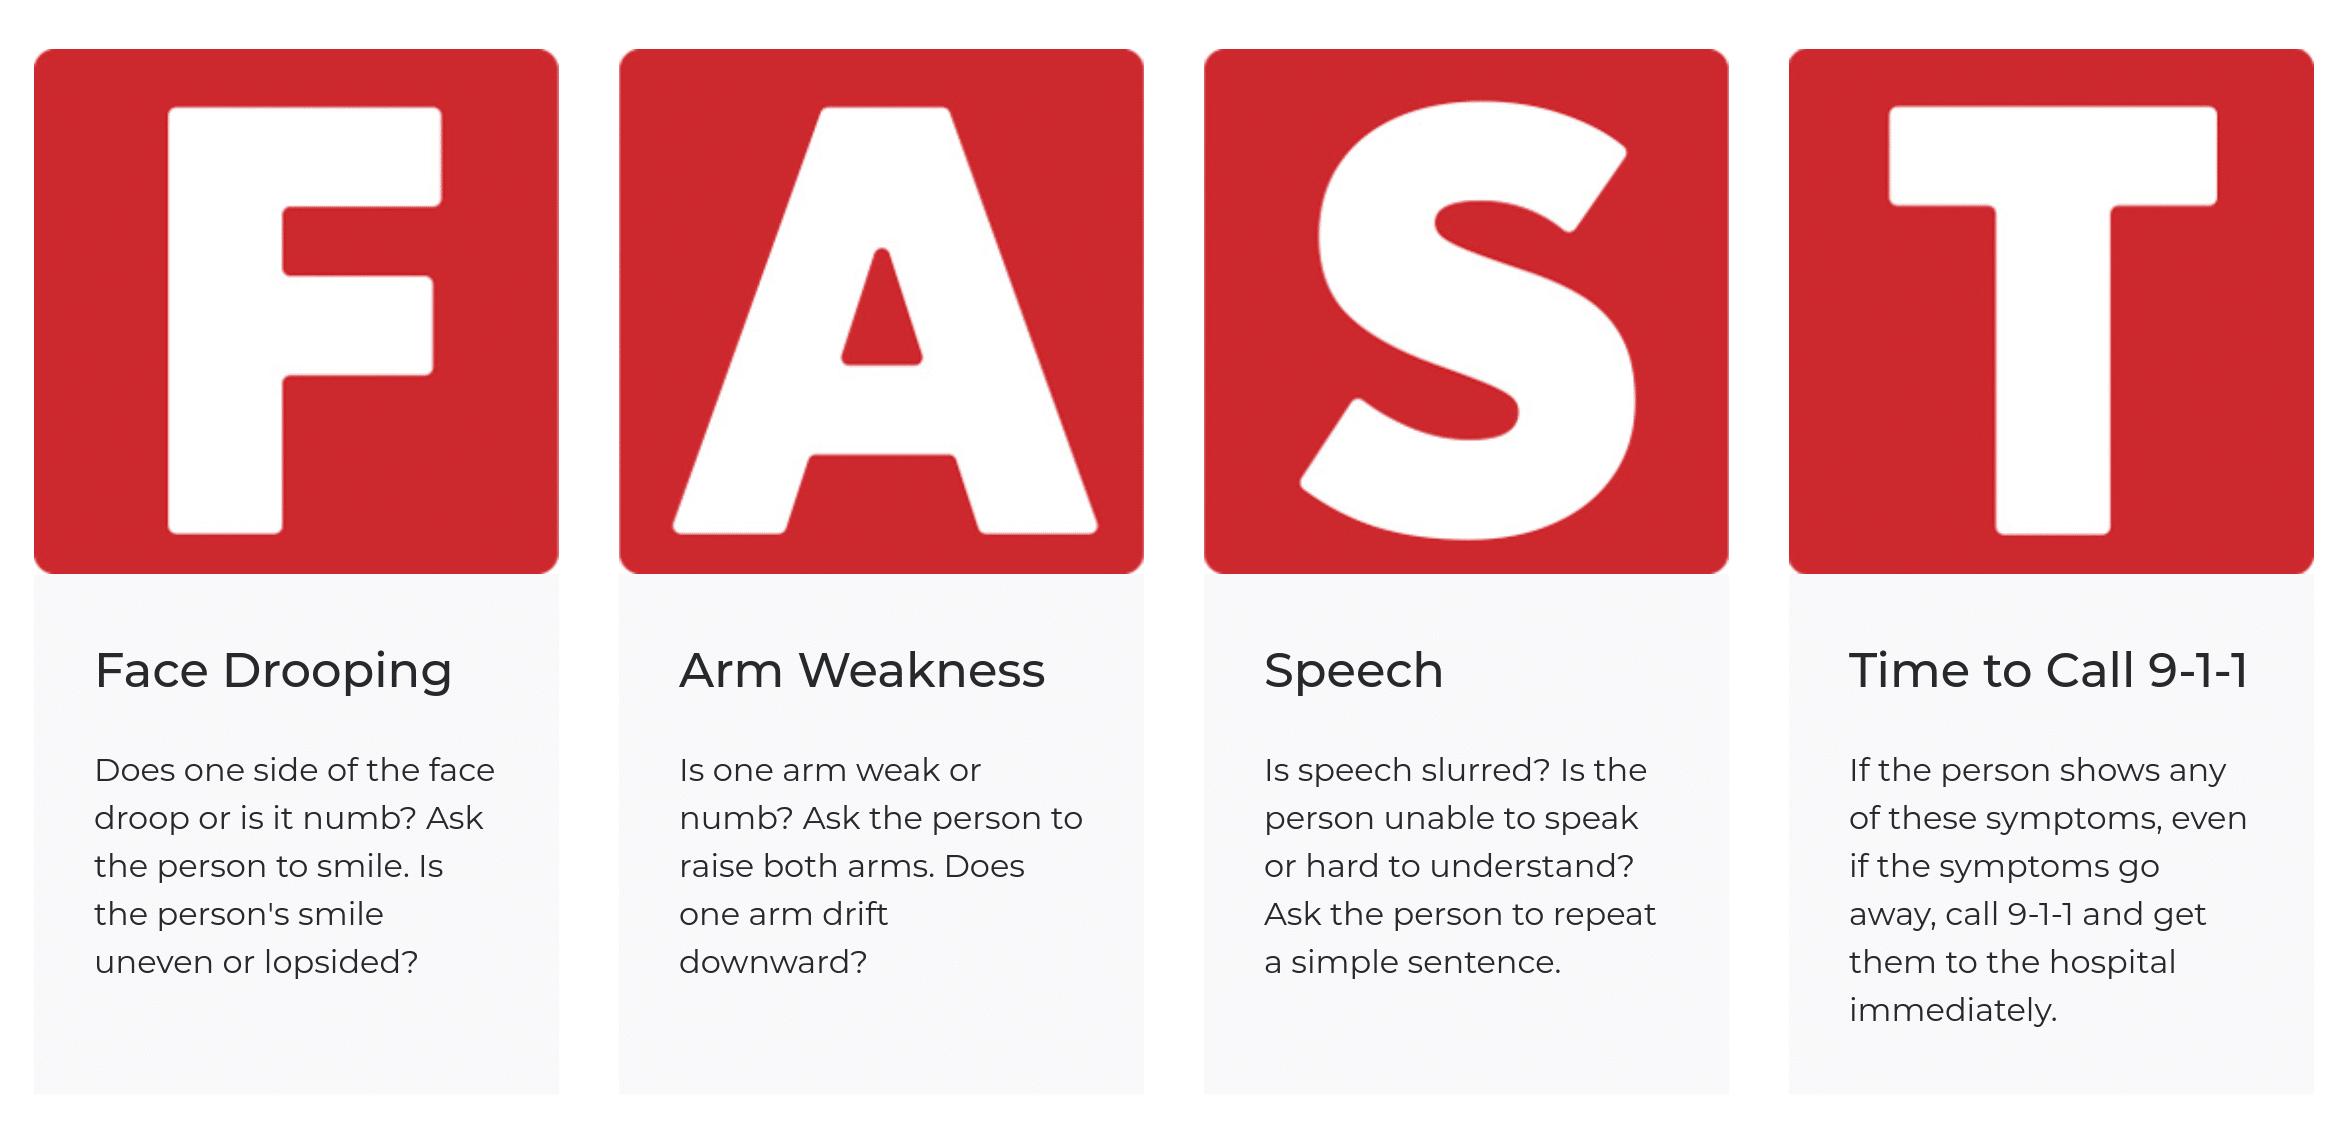 Stroke FAST acronym